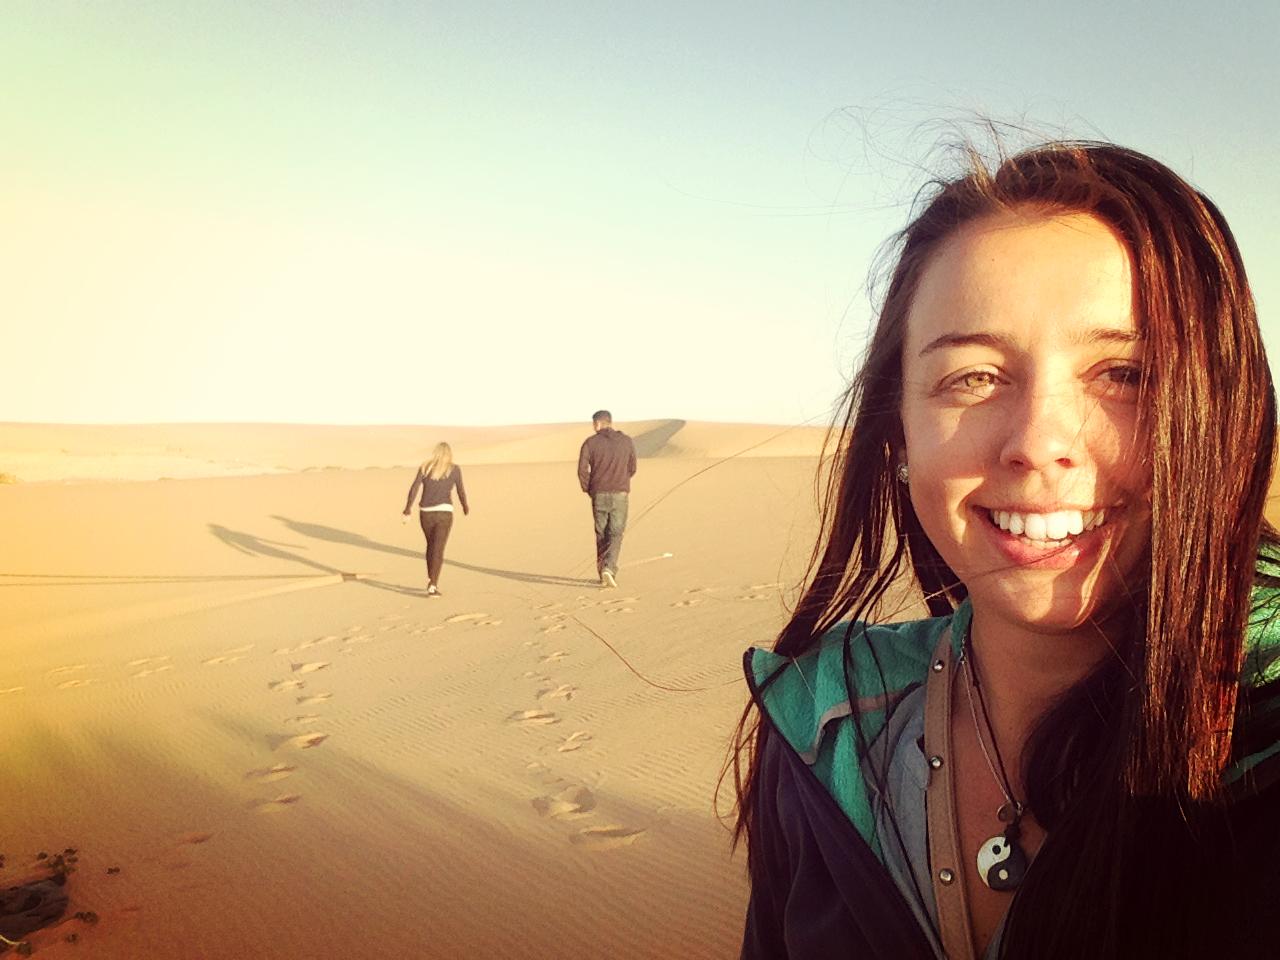 Global_Volunteer_Rebecca_D._in_Africa.png